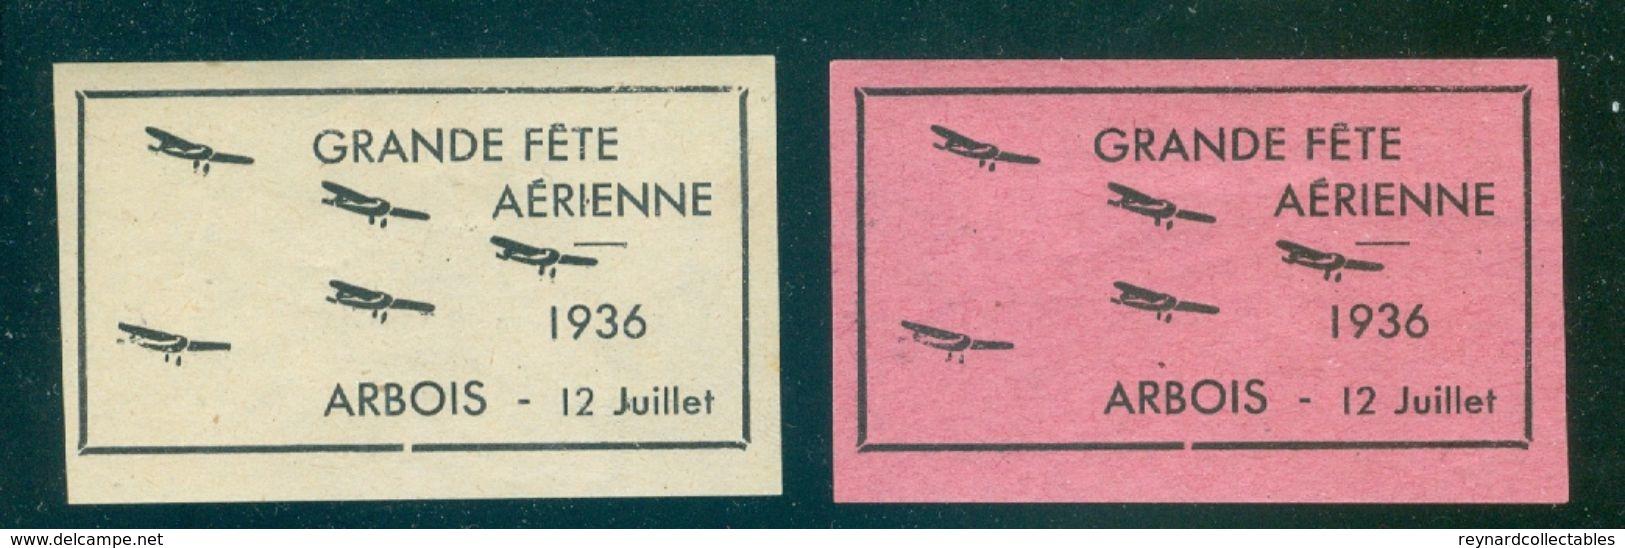 1936 France Arbois Grande Fete Aerienne Labels (2 Off) - Airmail